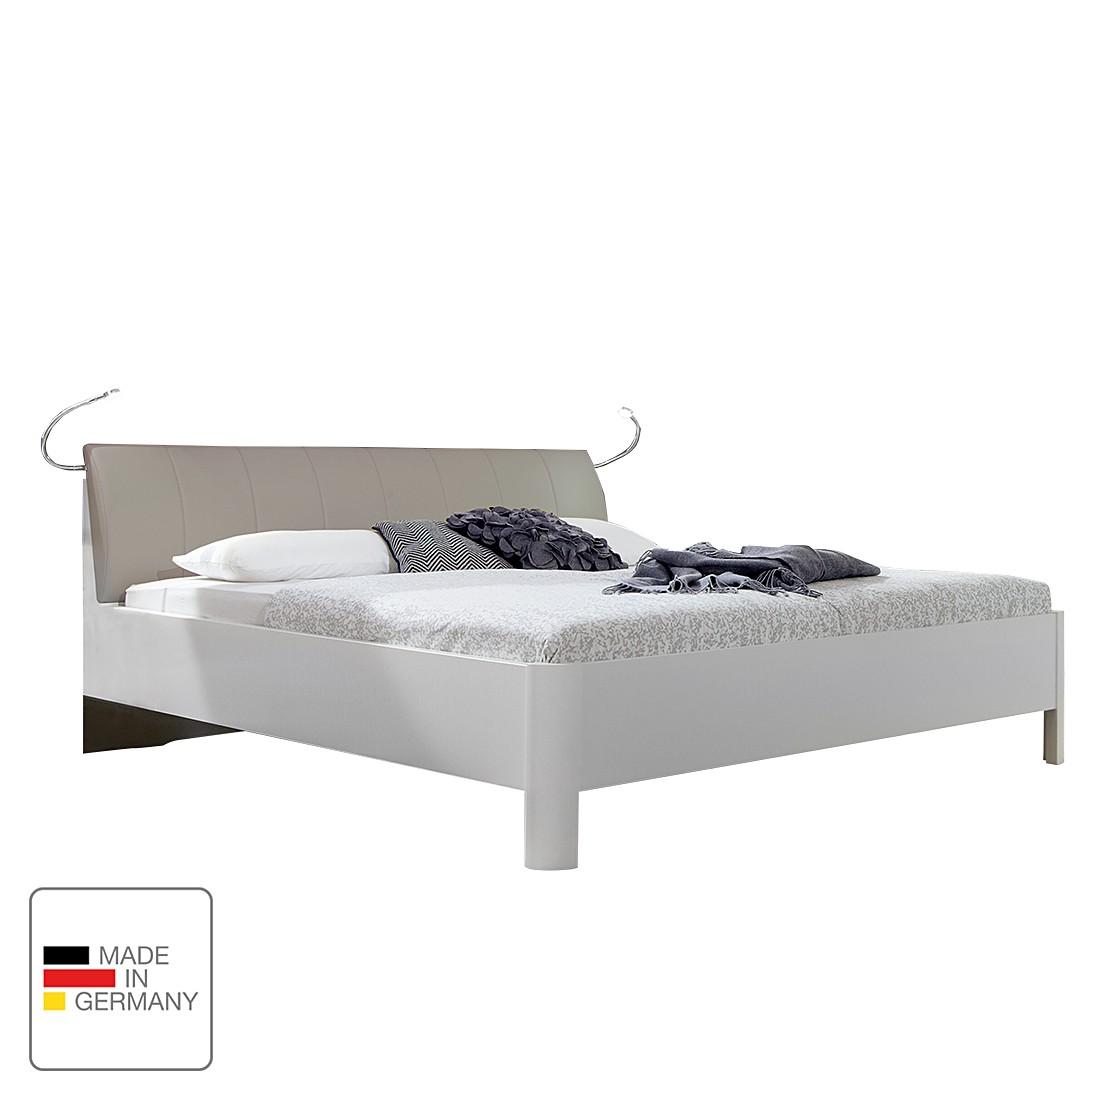 futonbett jive ii alpinwei kunstleder sahara 160 x 190cm mit beleuchtung standardh he. Black Bedroom Furniture Sets. Home Design Ideas